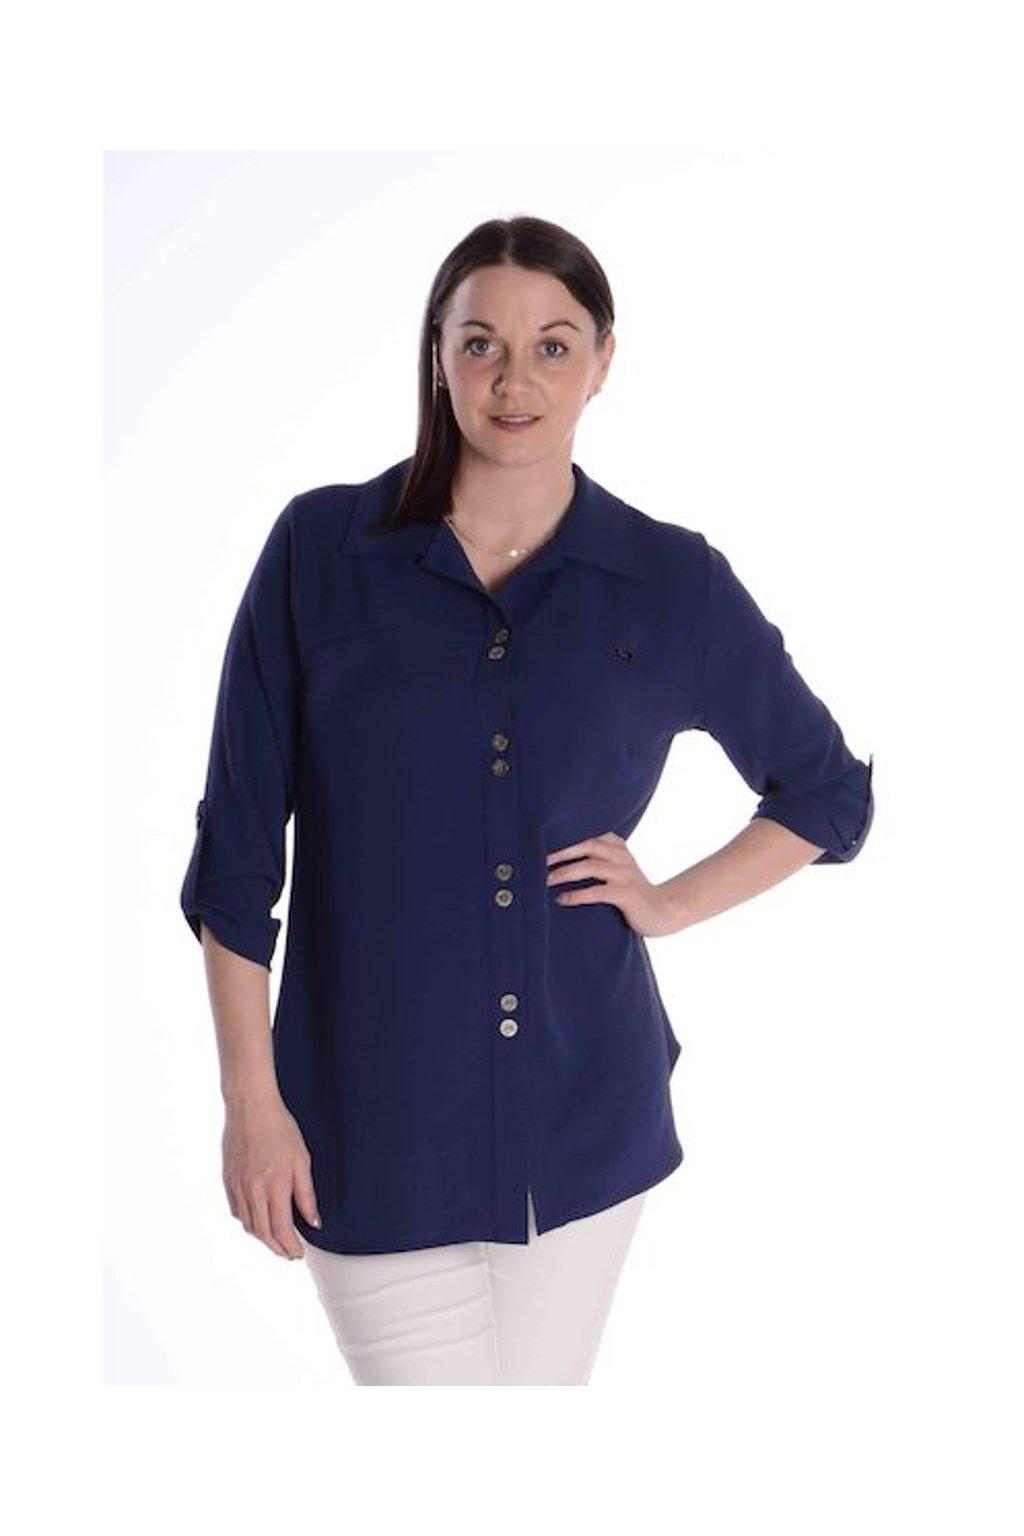 2421 Košile Chic (Velikost 36, Barva Modrá)